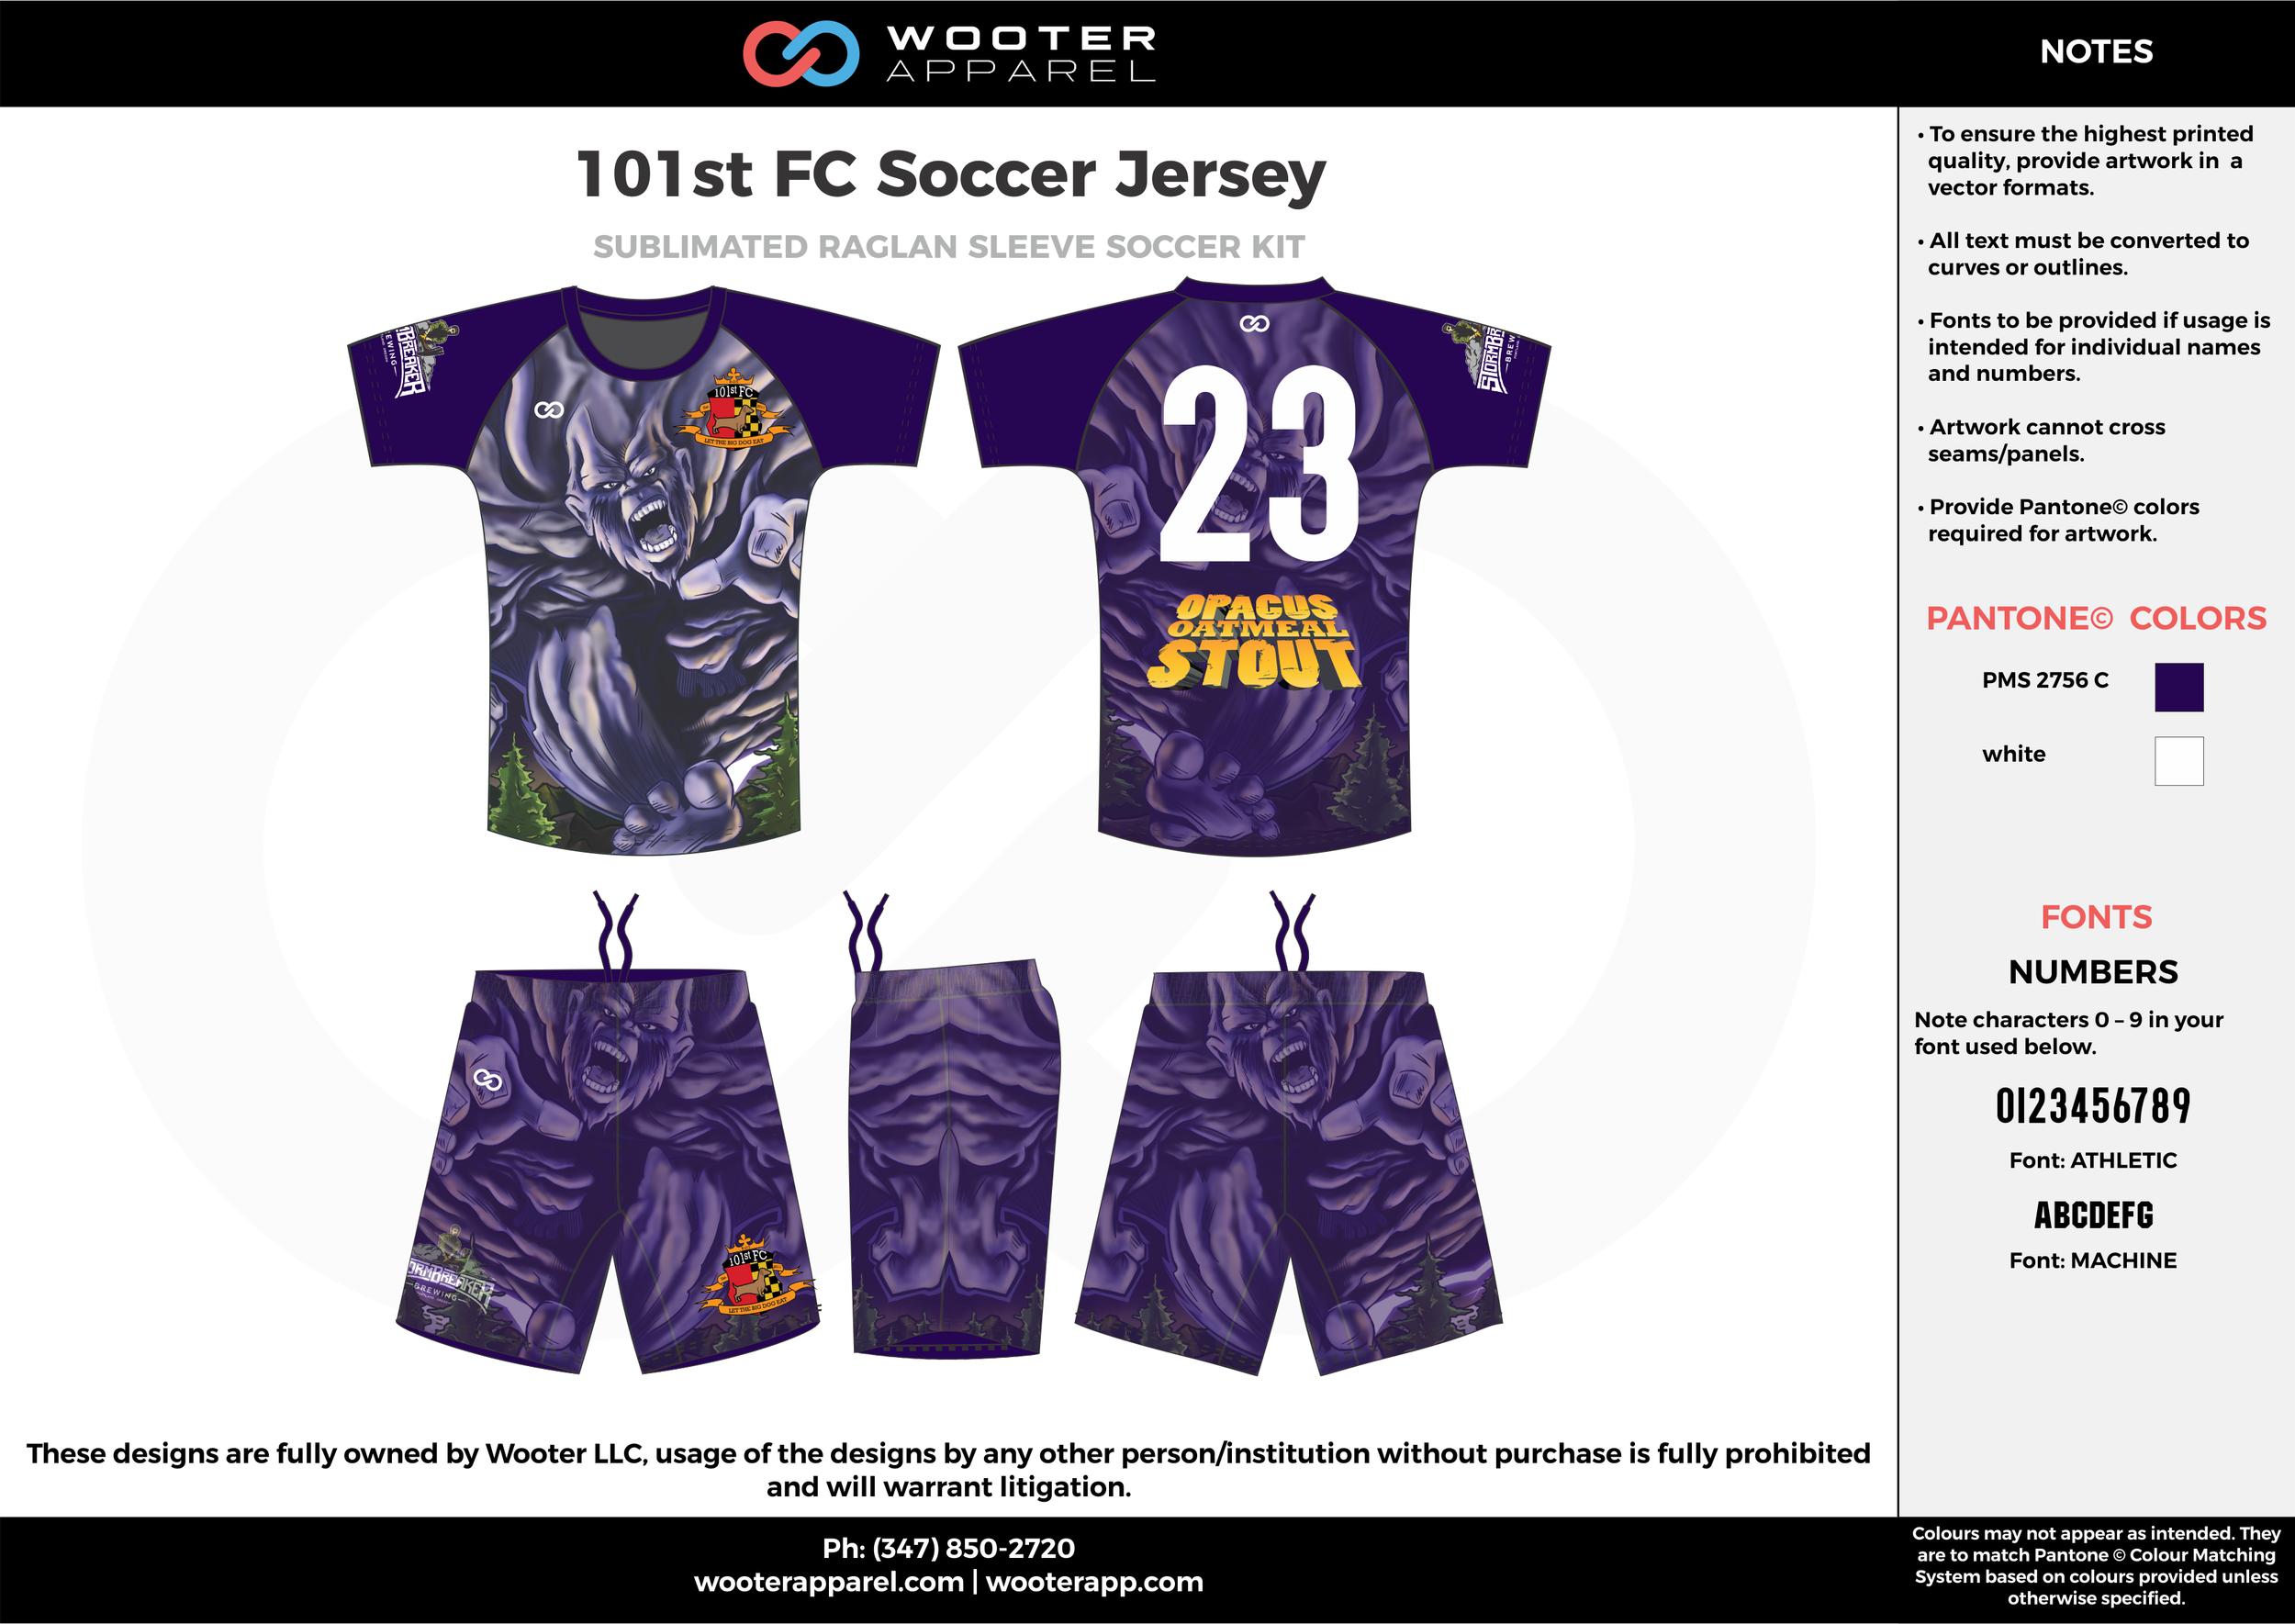 101st FC violet white custom sublimated soccer uniform jersey shirt shorts